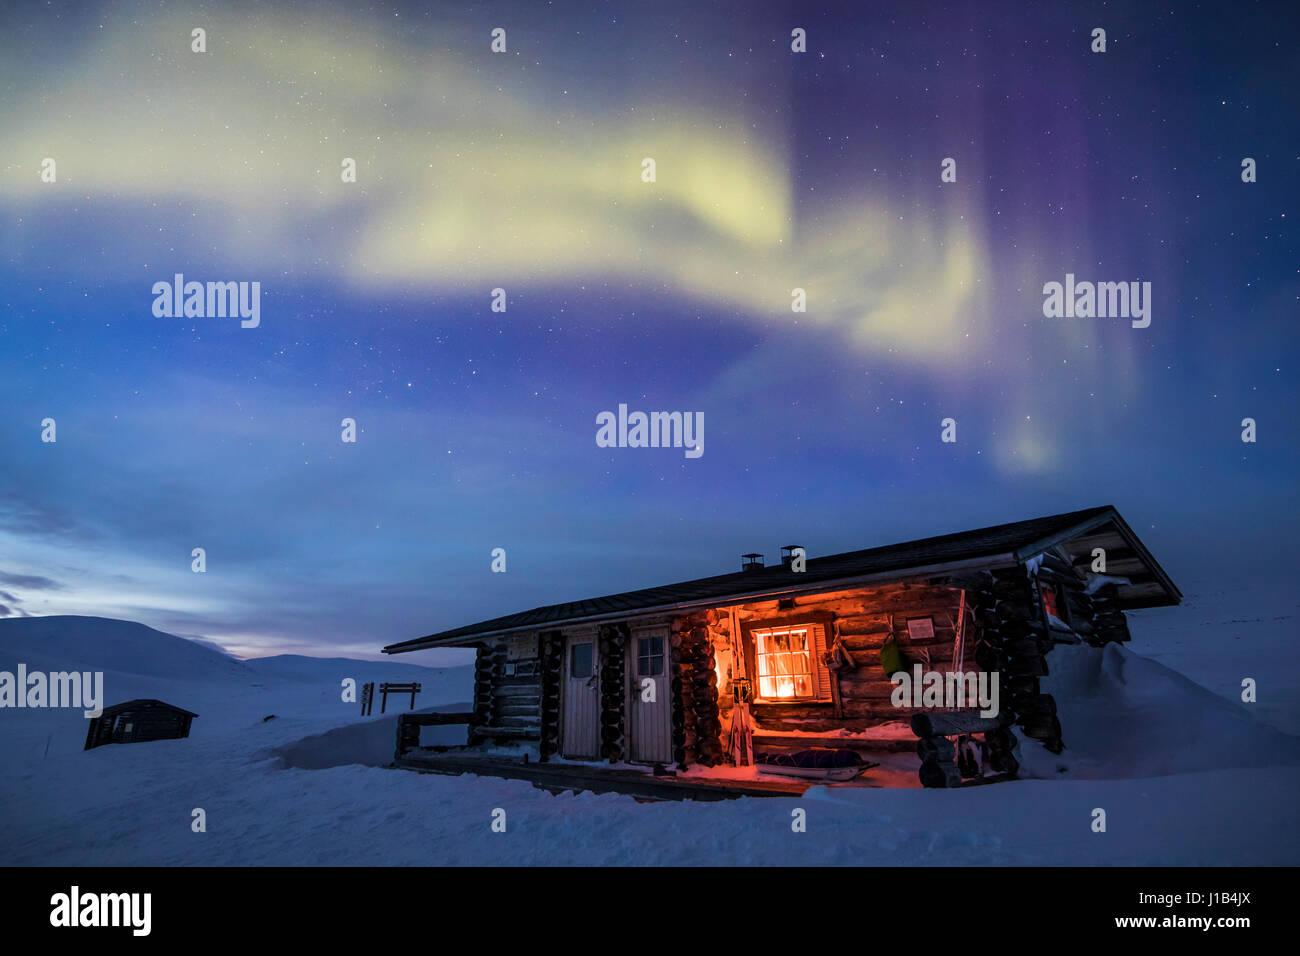 Öffnen pihtsusjärvi Wildnis Hütte Stockbild